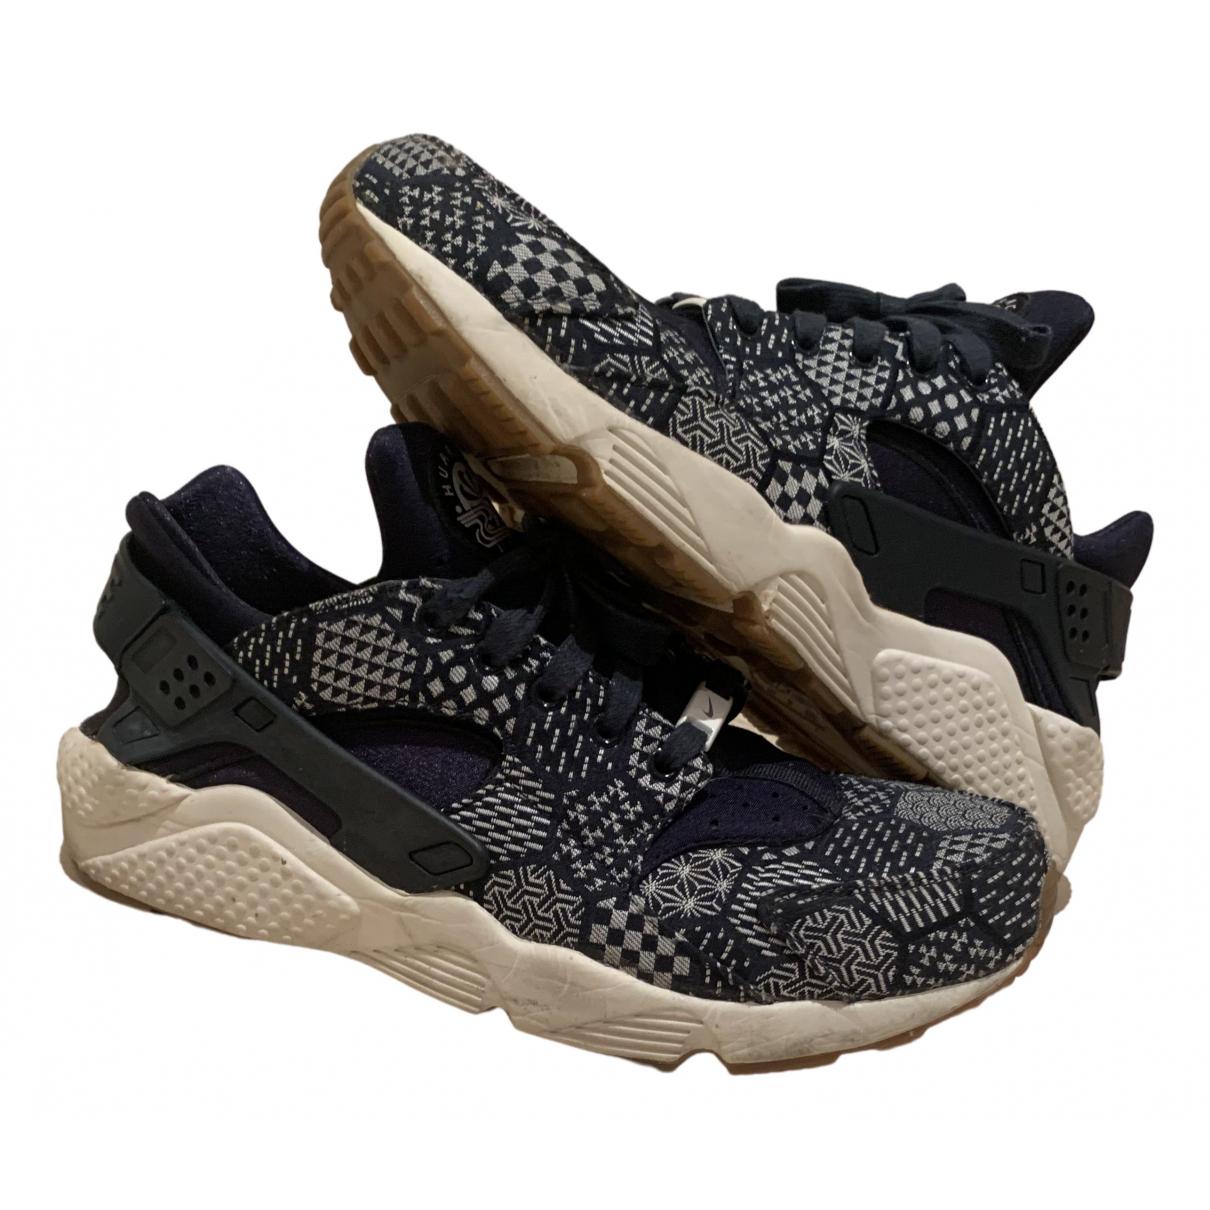 Nike - Baskets Huarache pour homme en toile - bleu